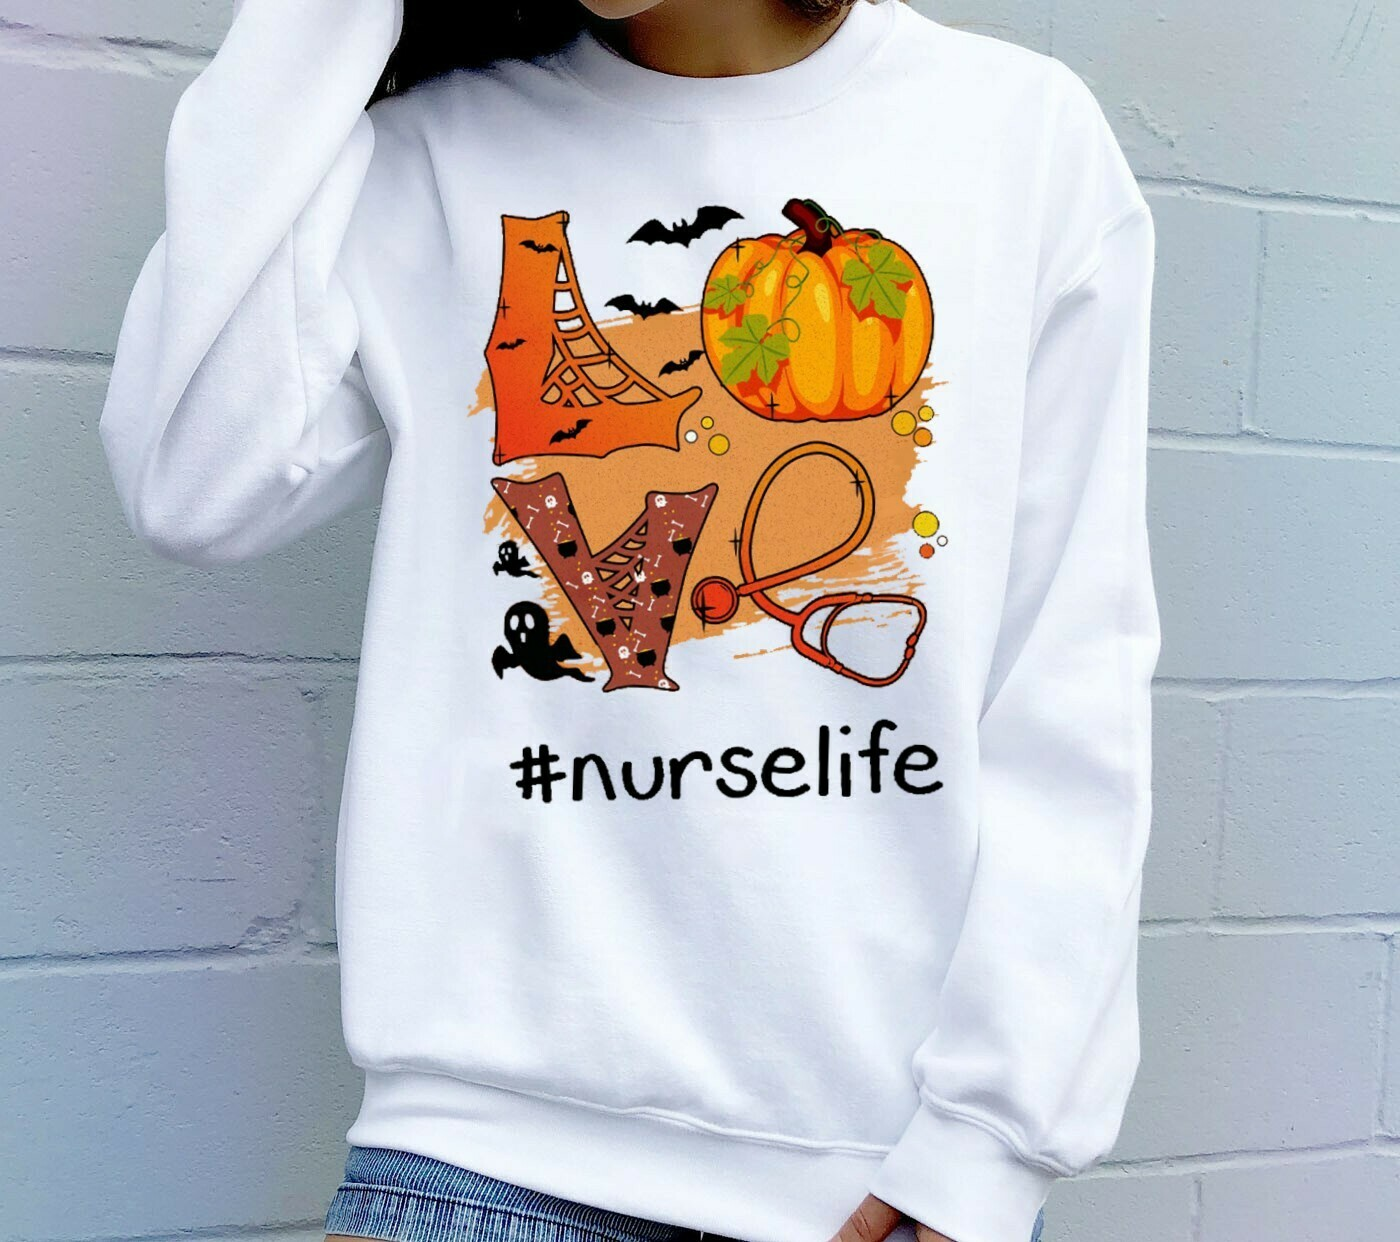 Love Nurselife Pumpkin Halloween Gift T-Shirt for Nurse Heartbeats Nursing Student Graduation School RN Registered Halloween Vacation Long Sleeve Sweatshirt Hoodie Jolly Family Gifts